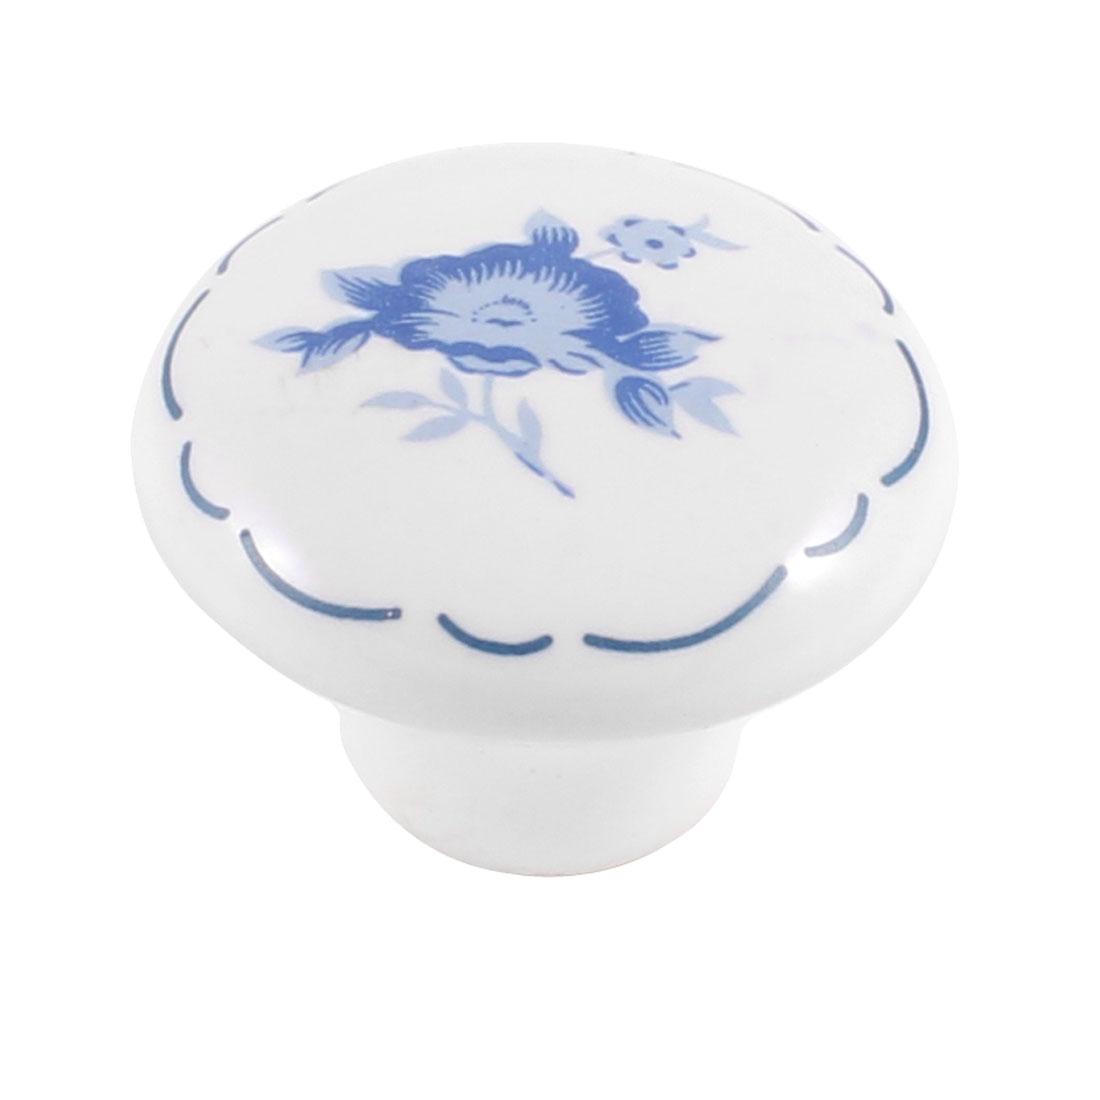 Hardware Part Steel Blue Floral Printed White Ceramic Rounded Door Drawer Knob